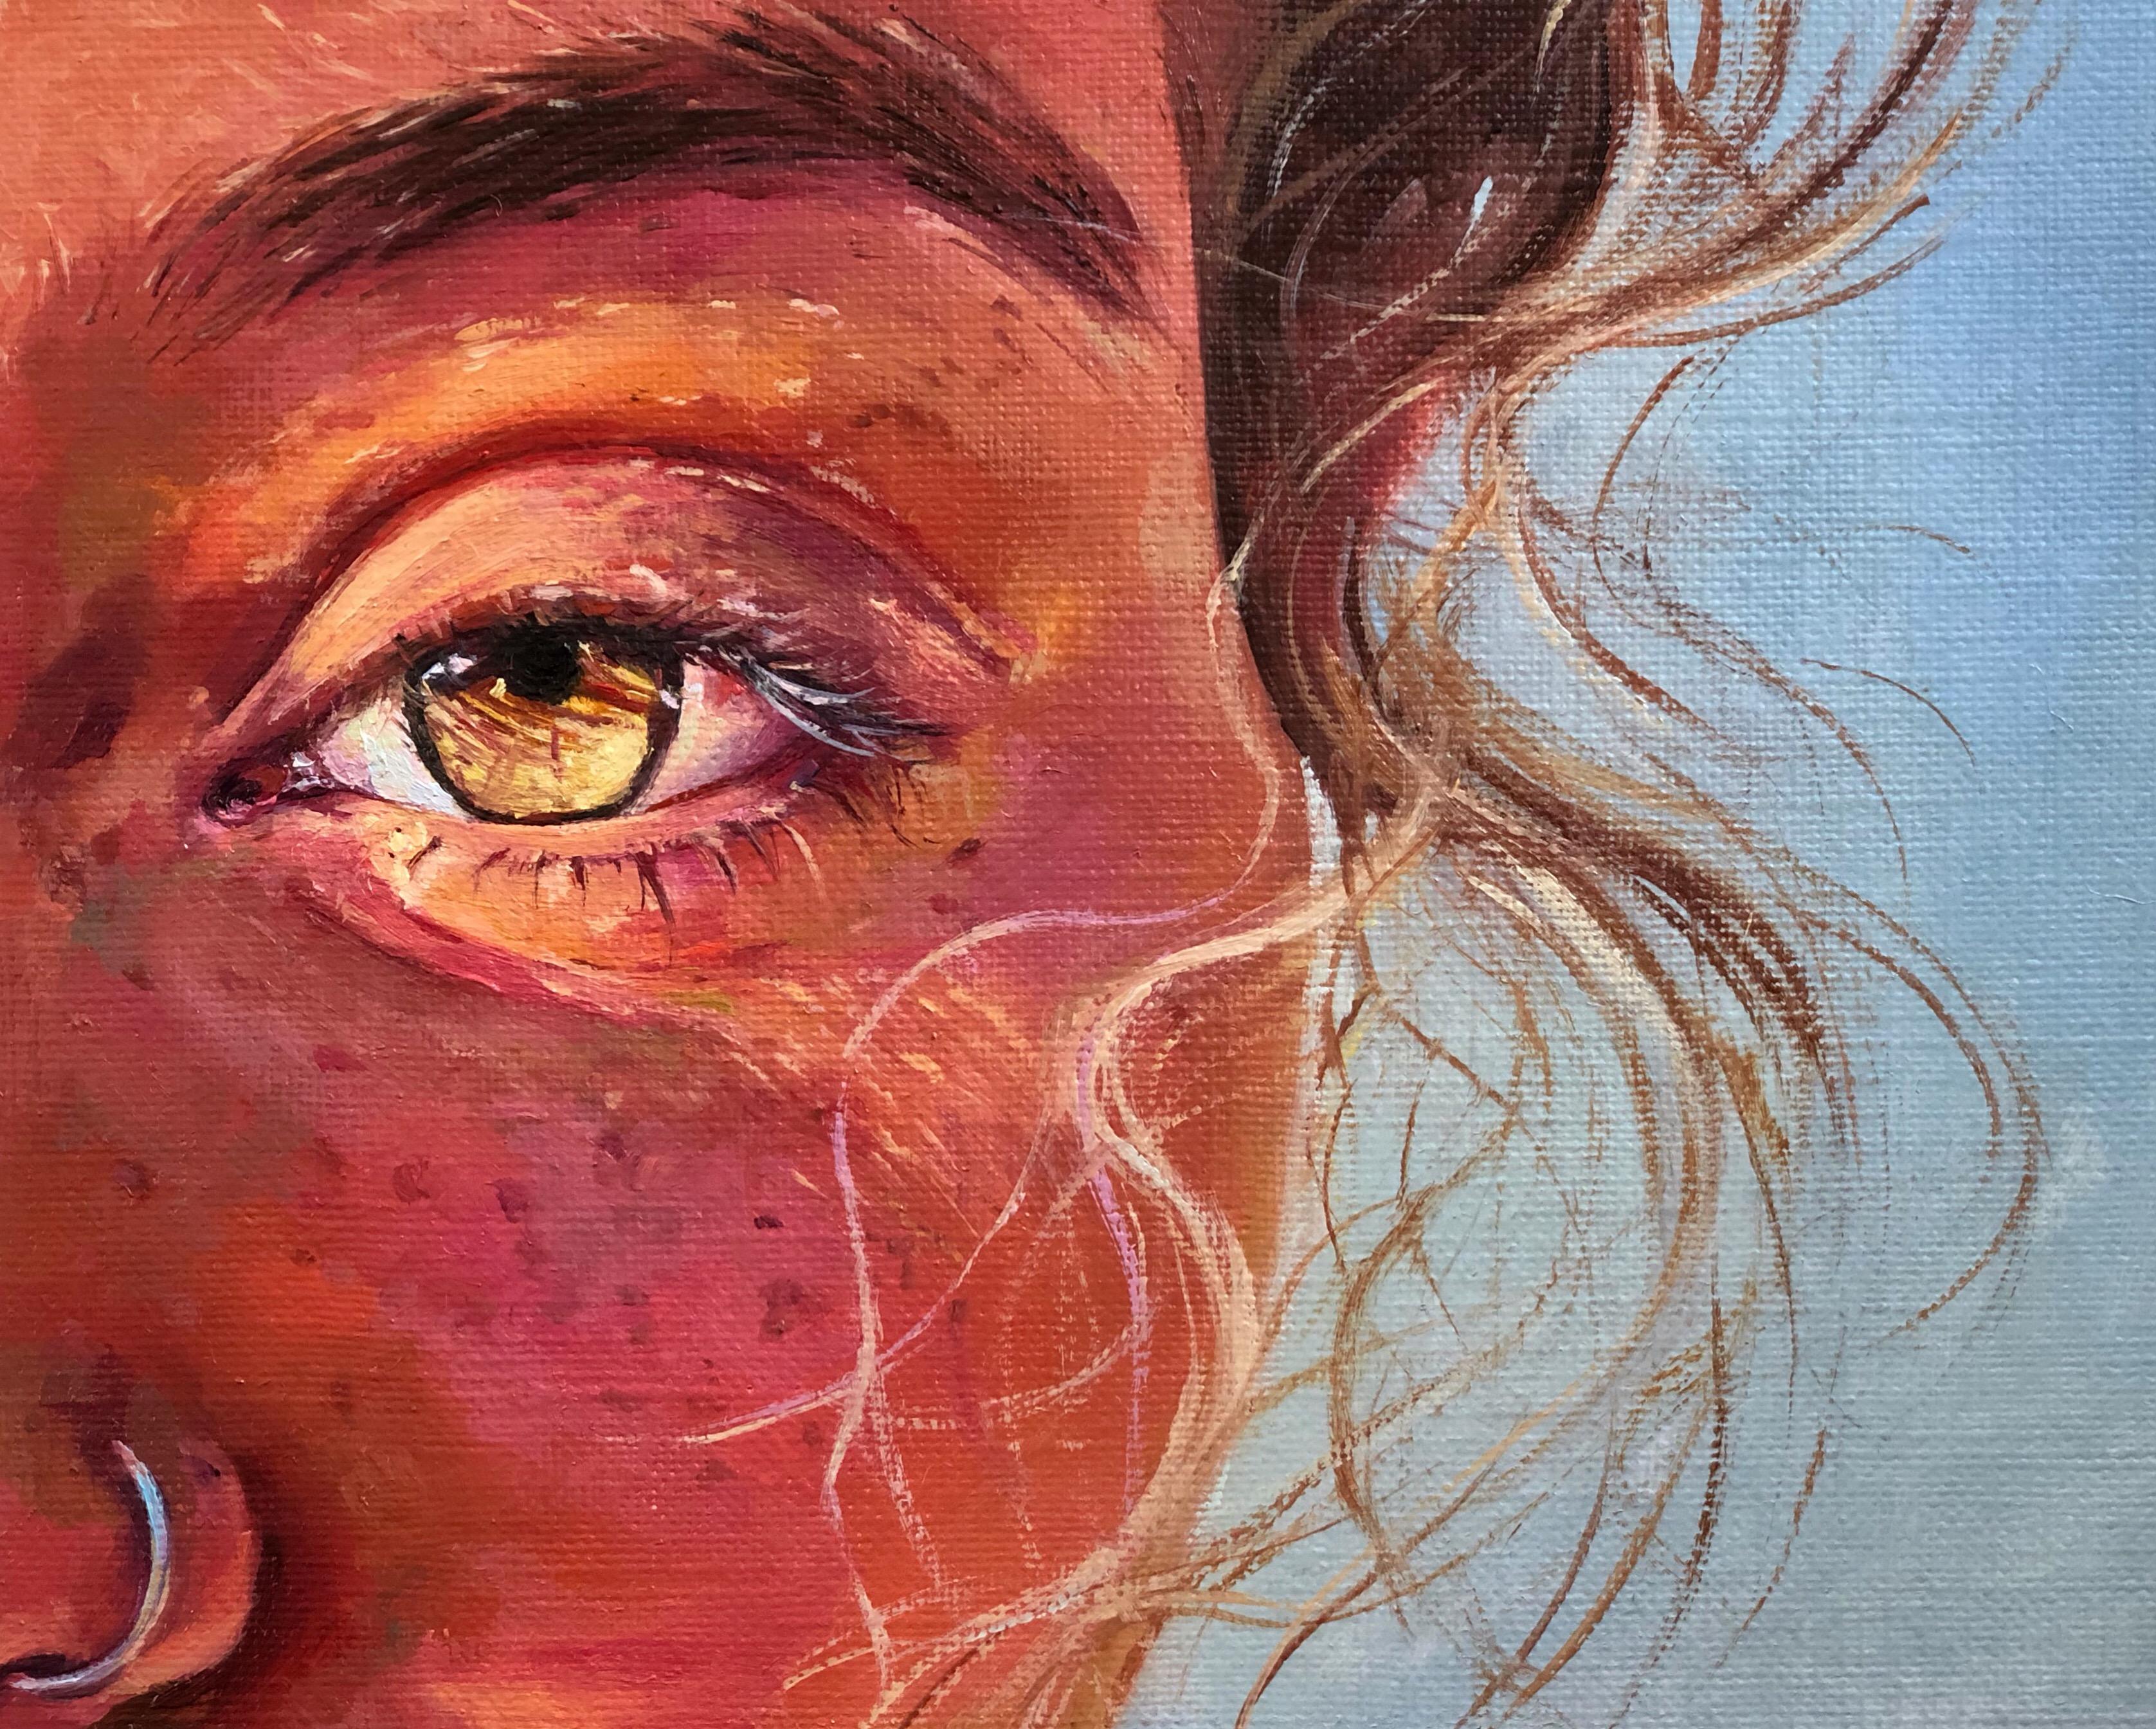 Painter Veronika Aron